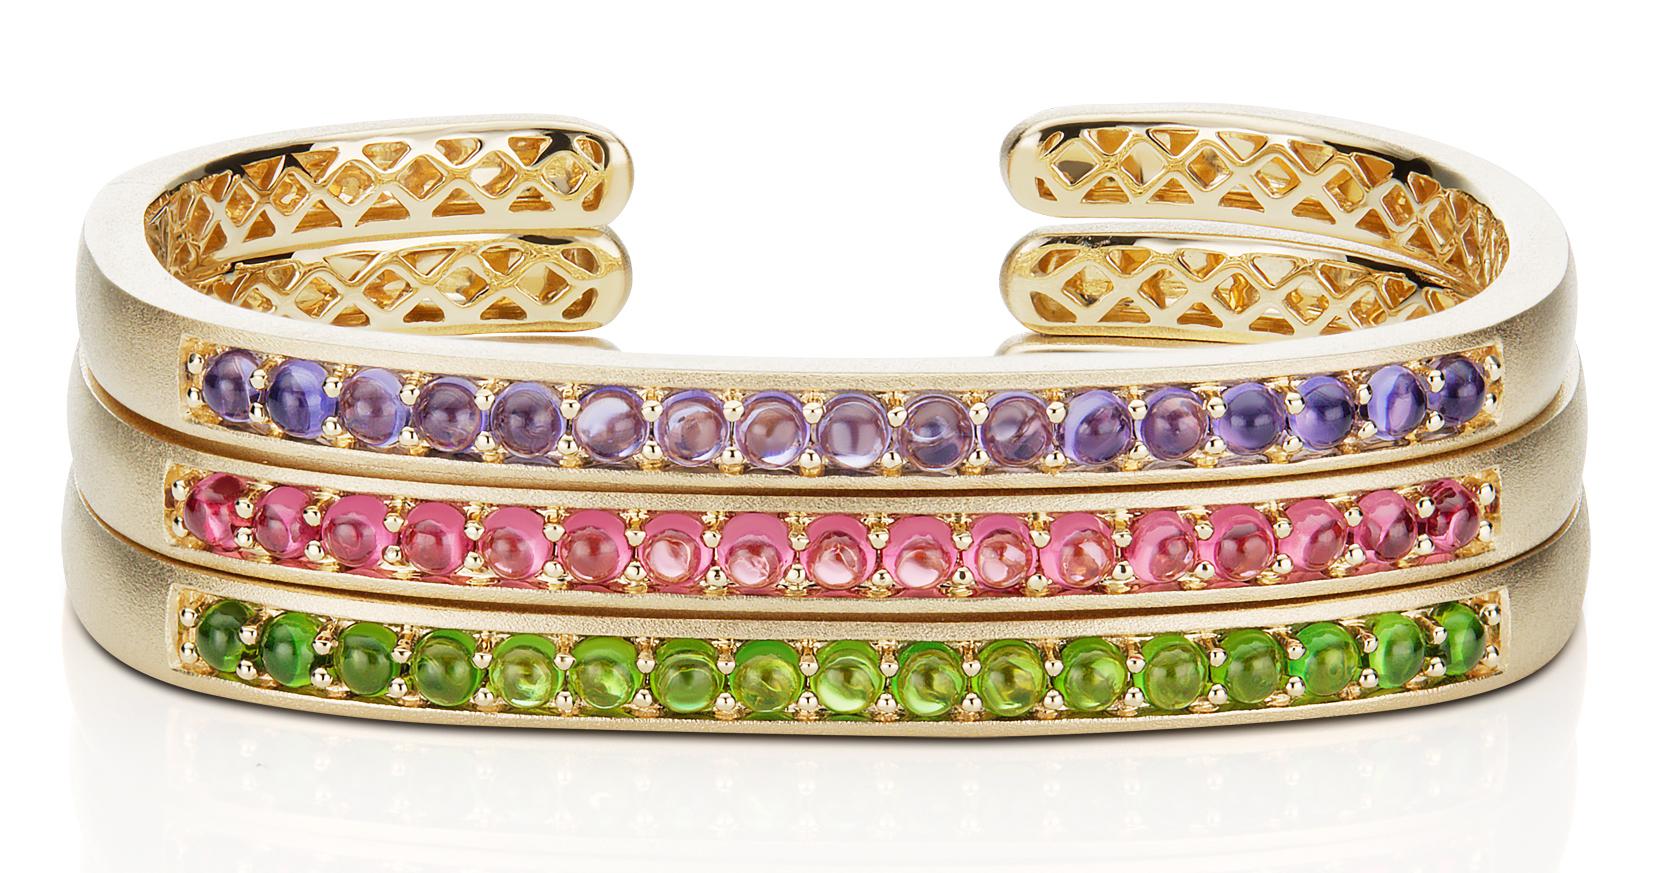 Jane Taylor Cirque cabochon bracelets | JCK On Your Market